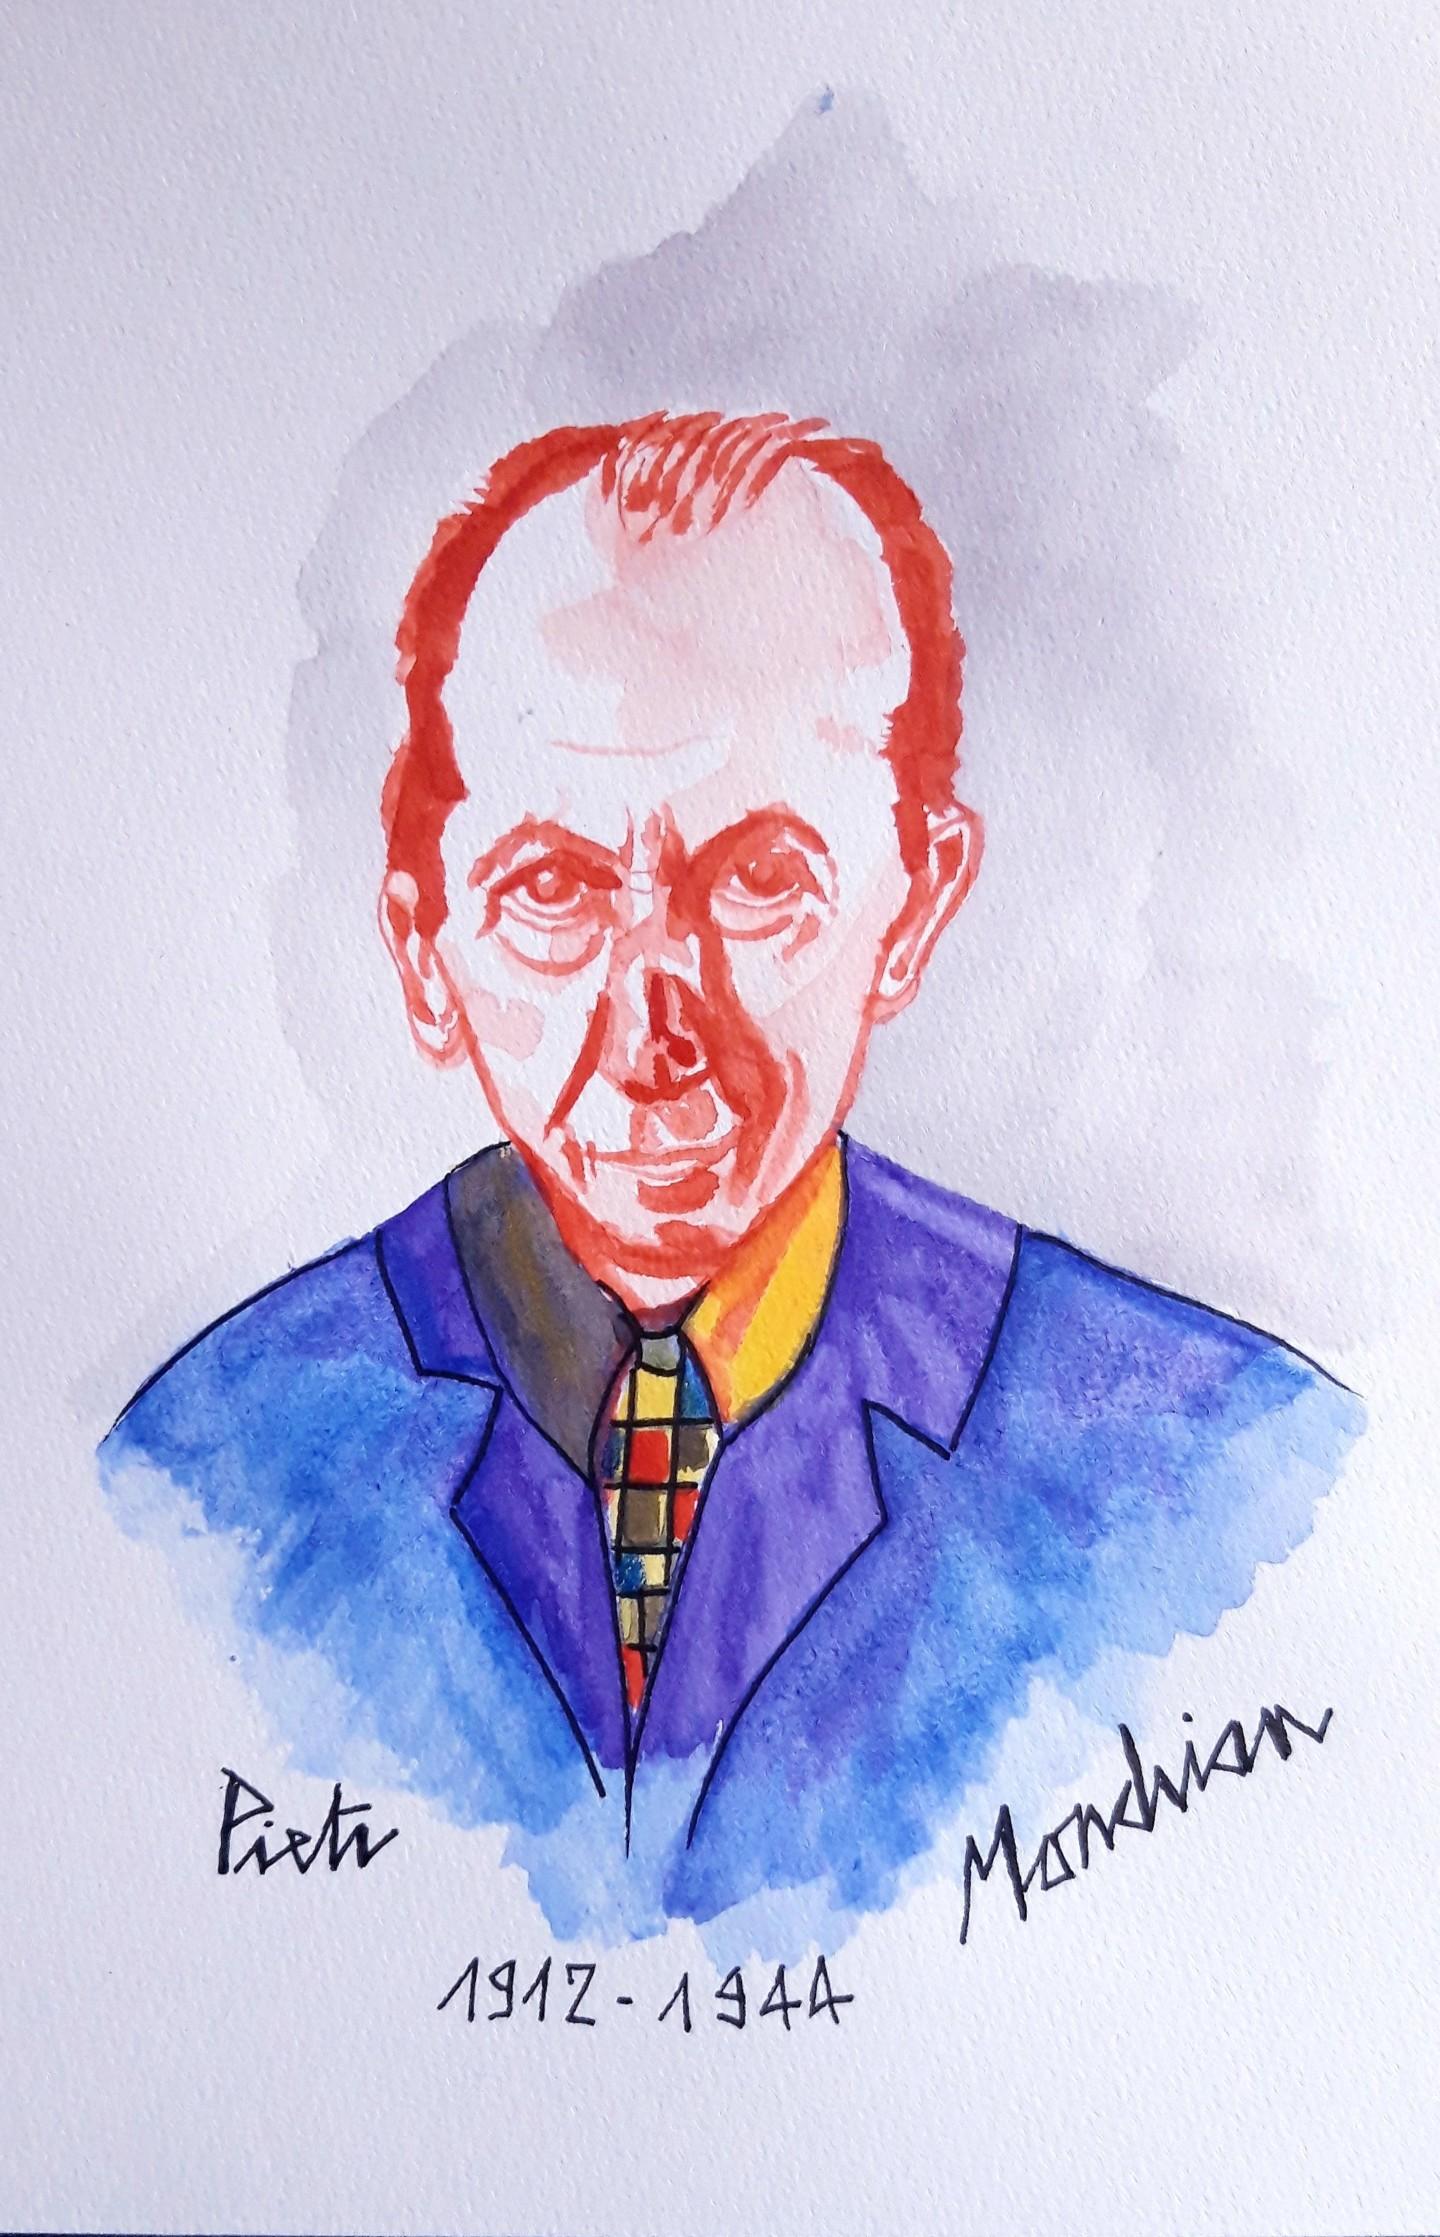 Brigitte Mathé (MBL) - Mondrian